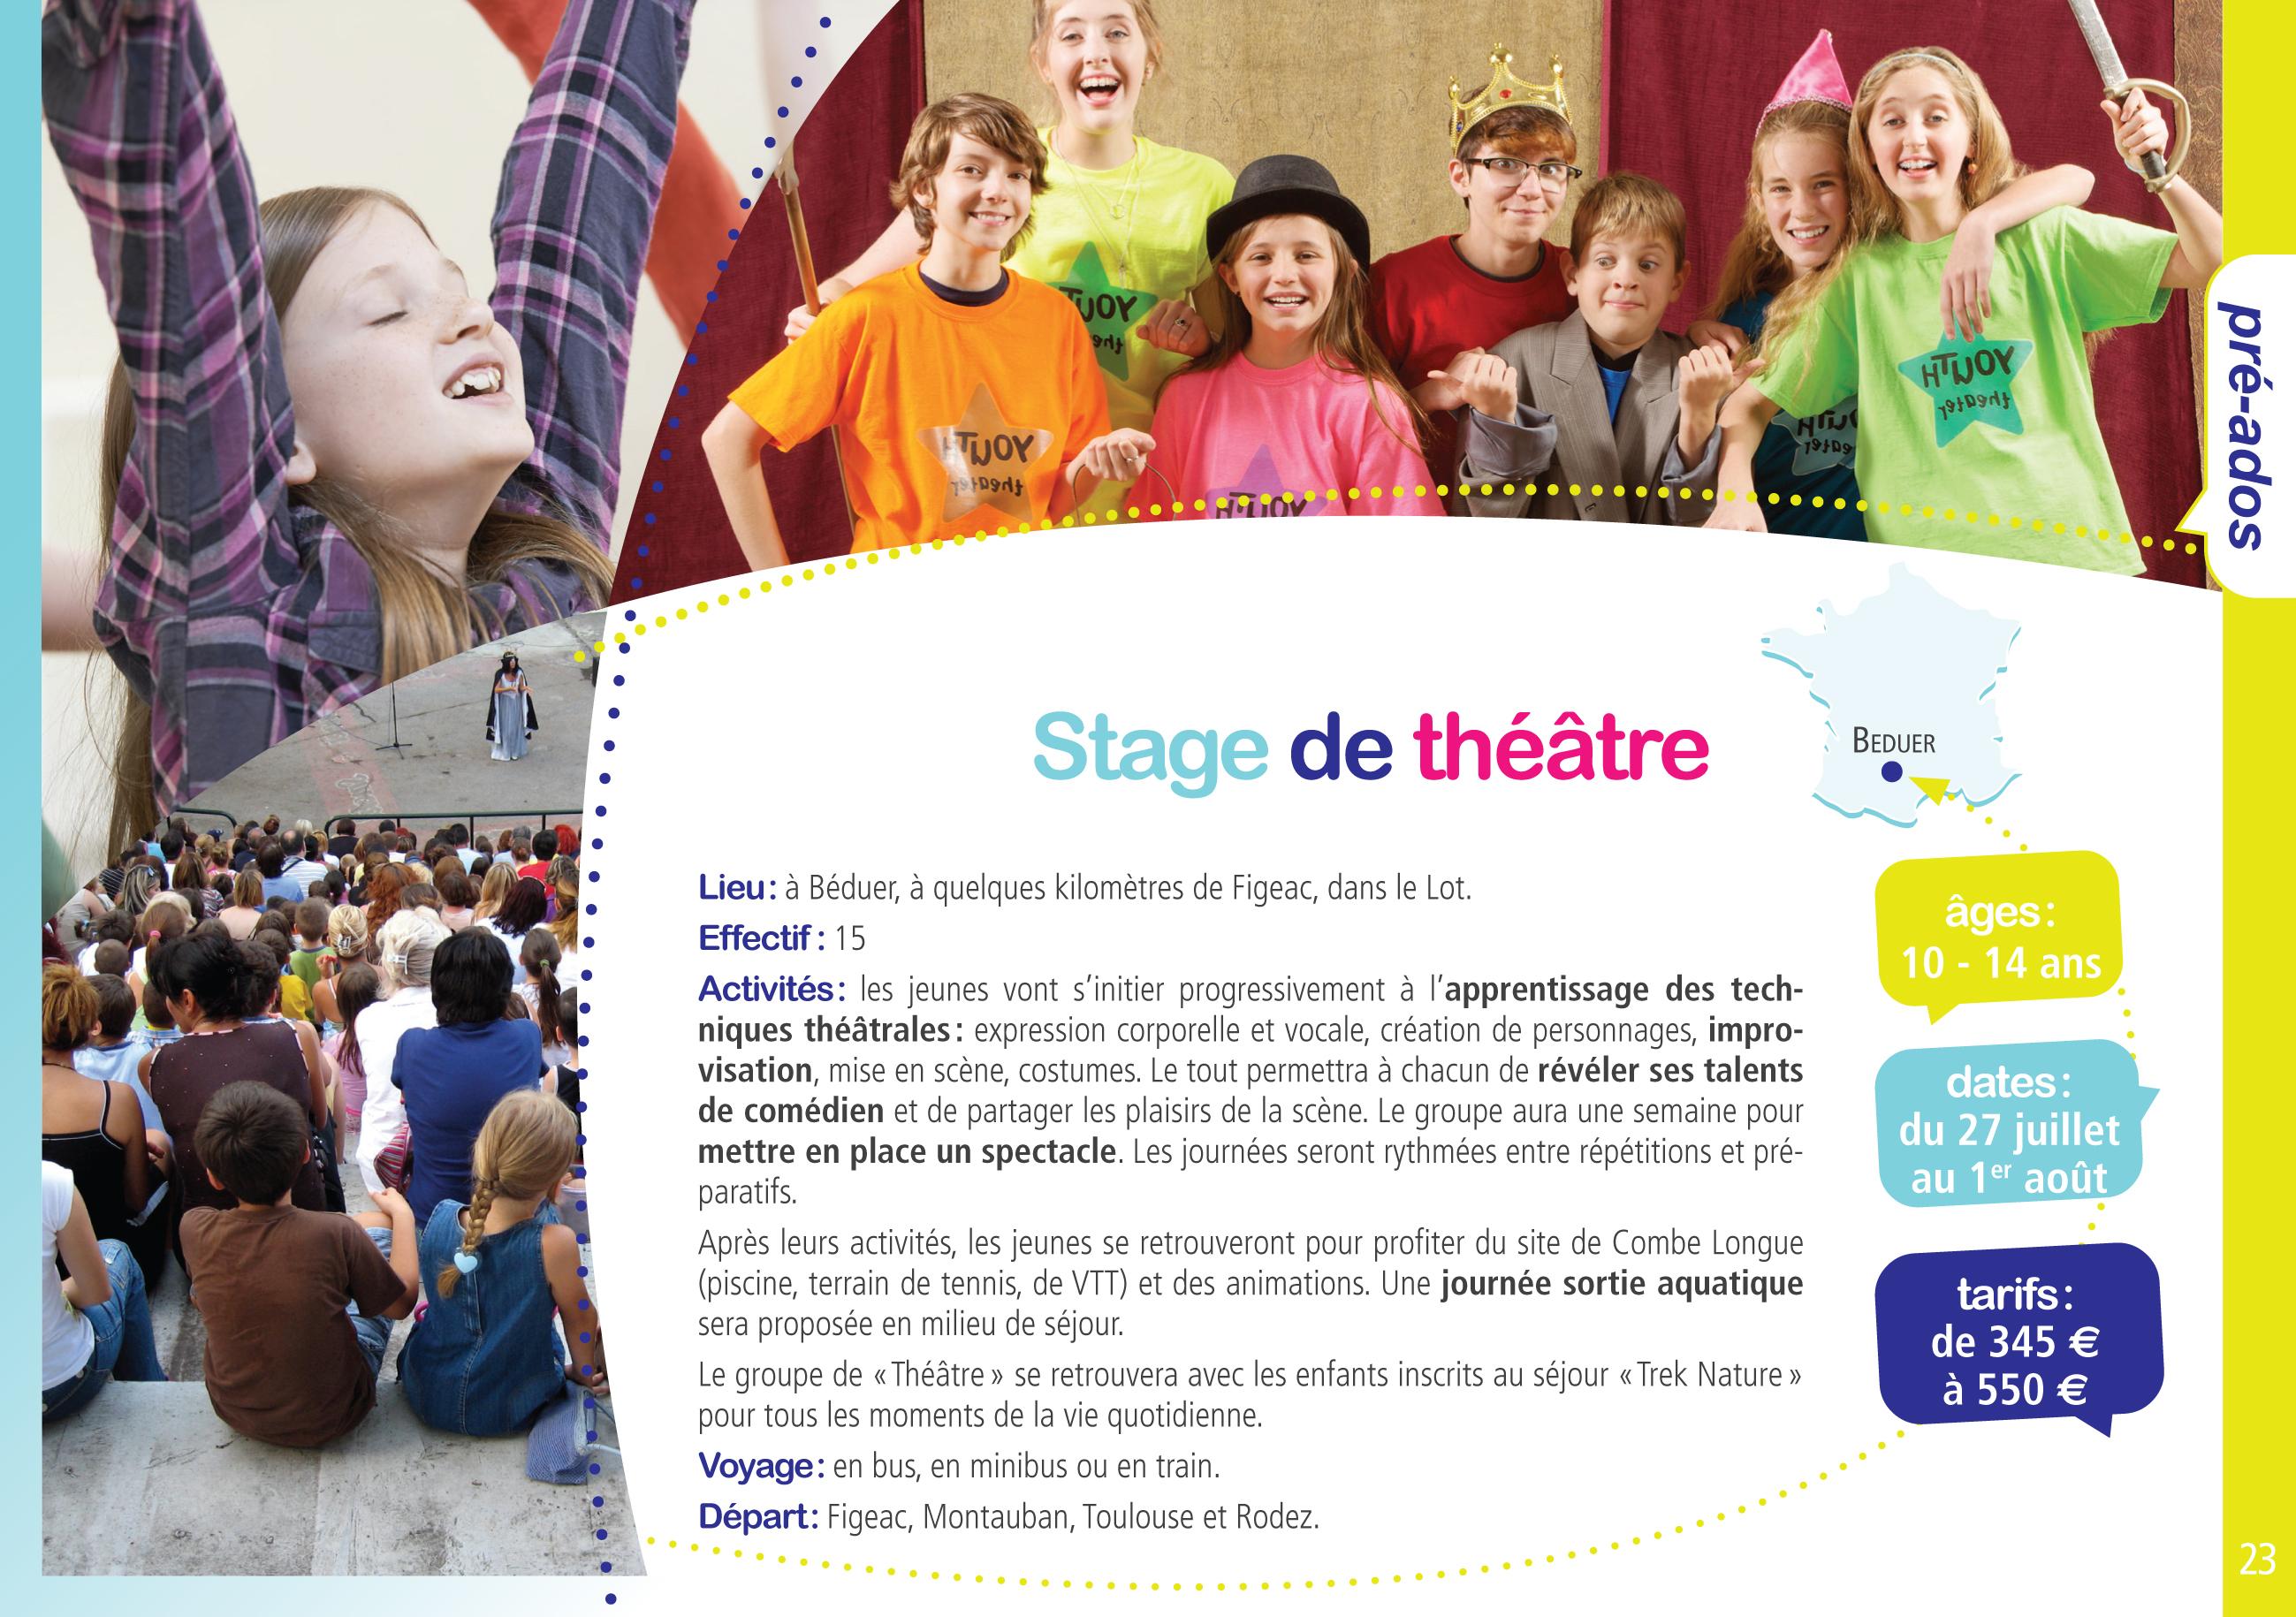 stage de theatre